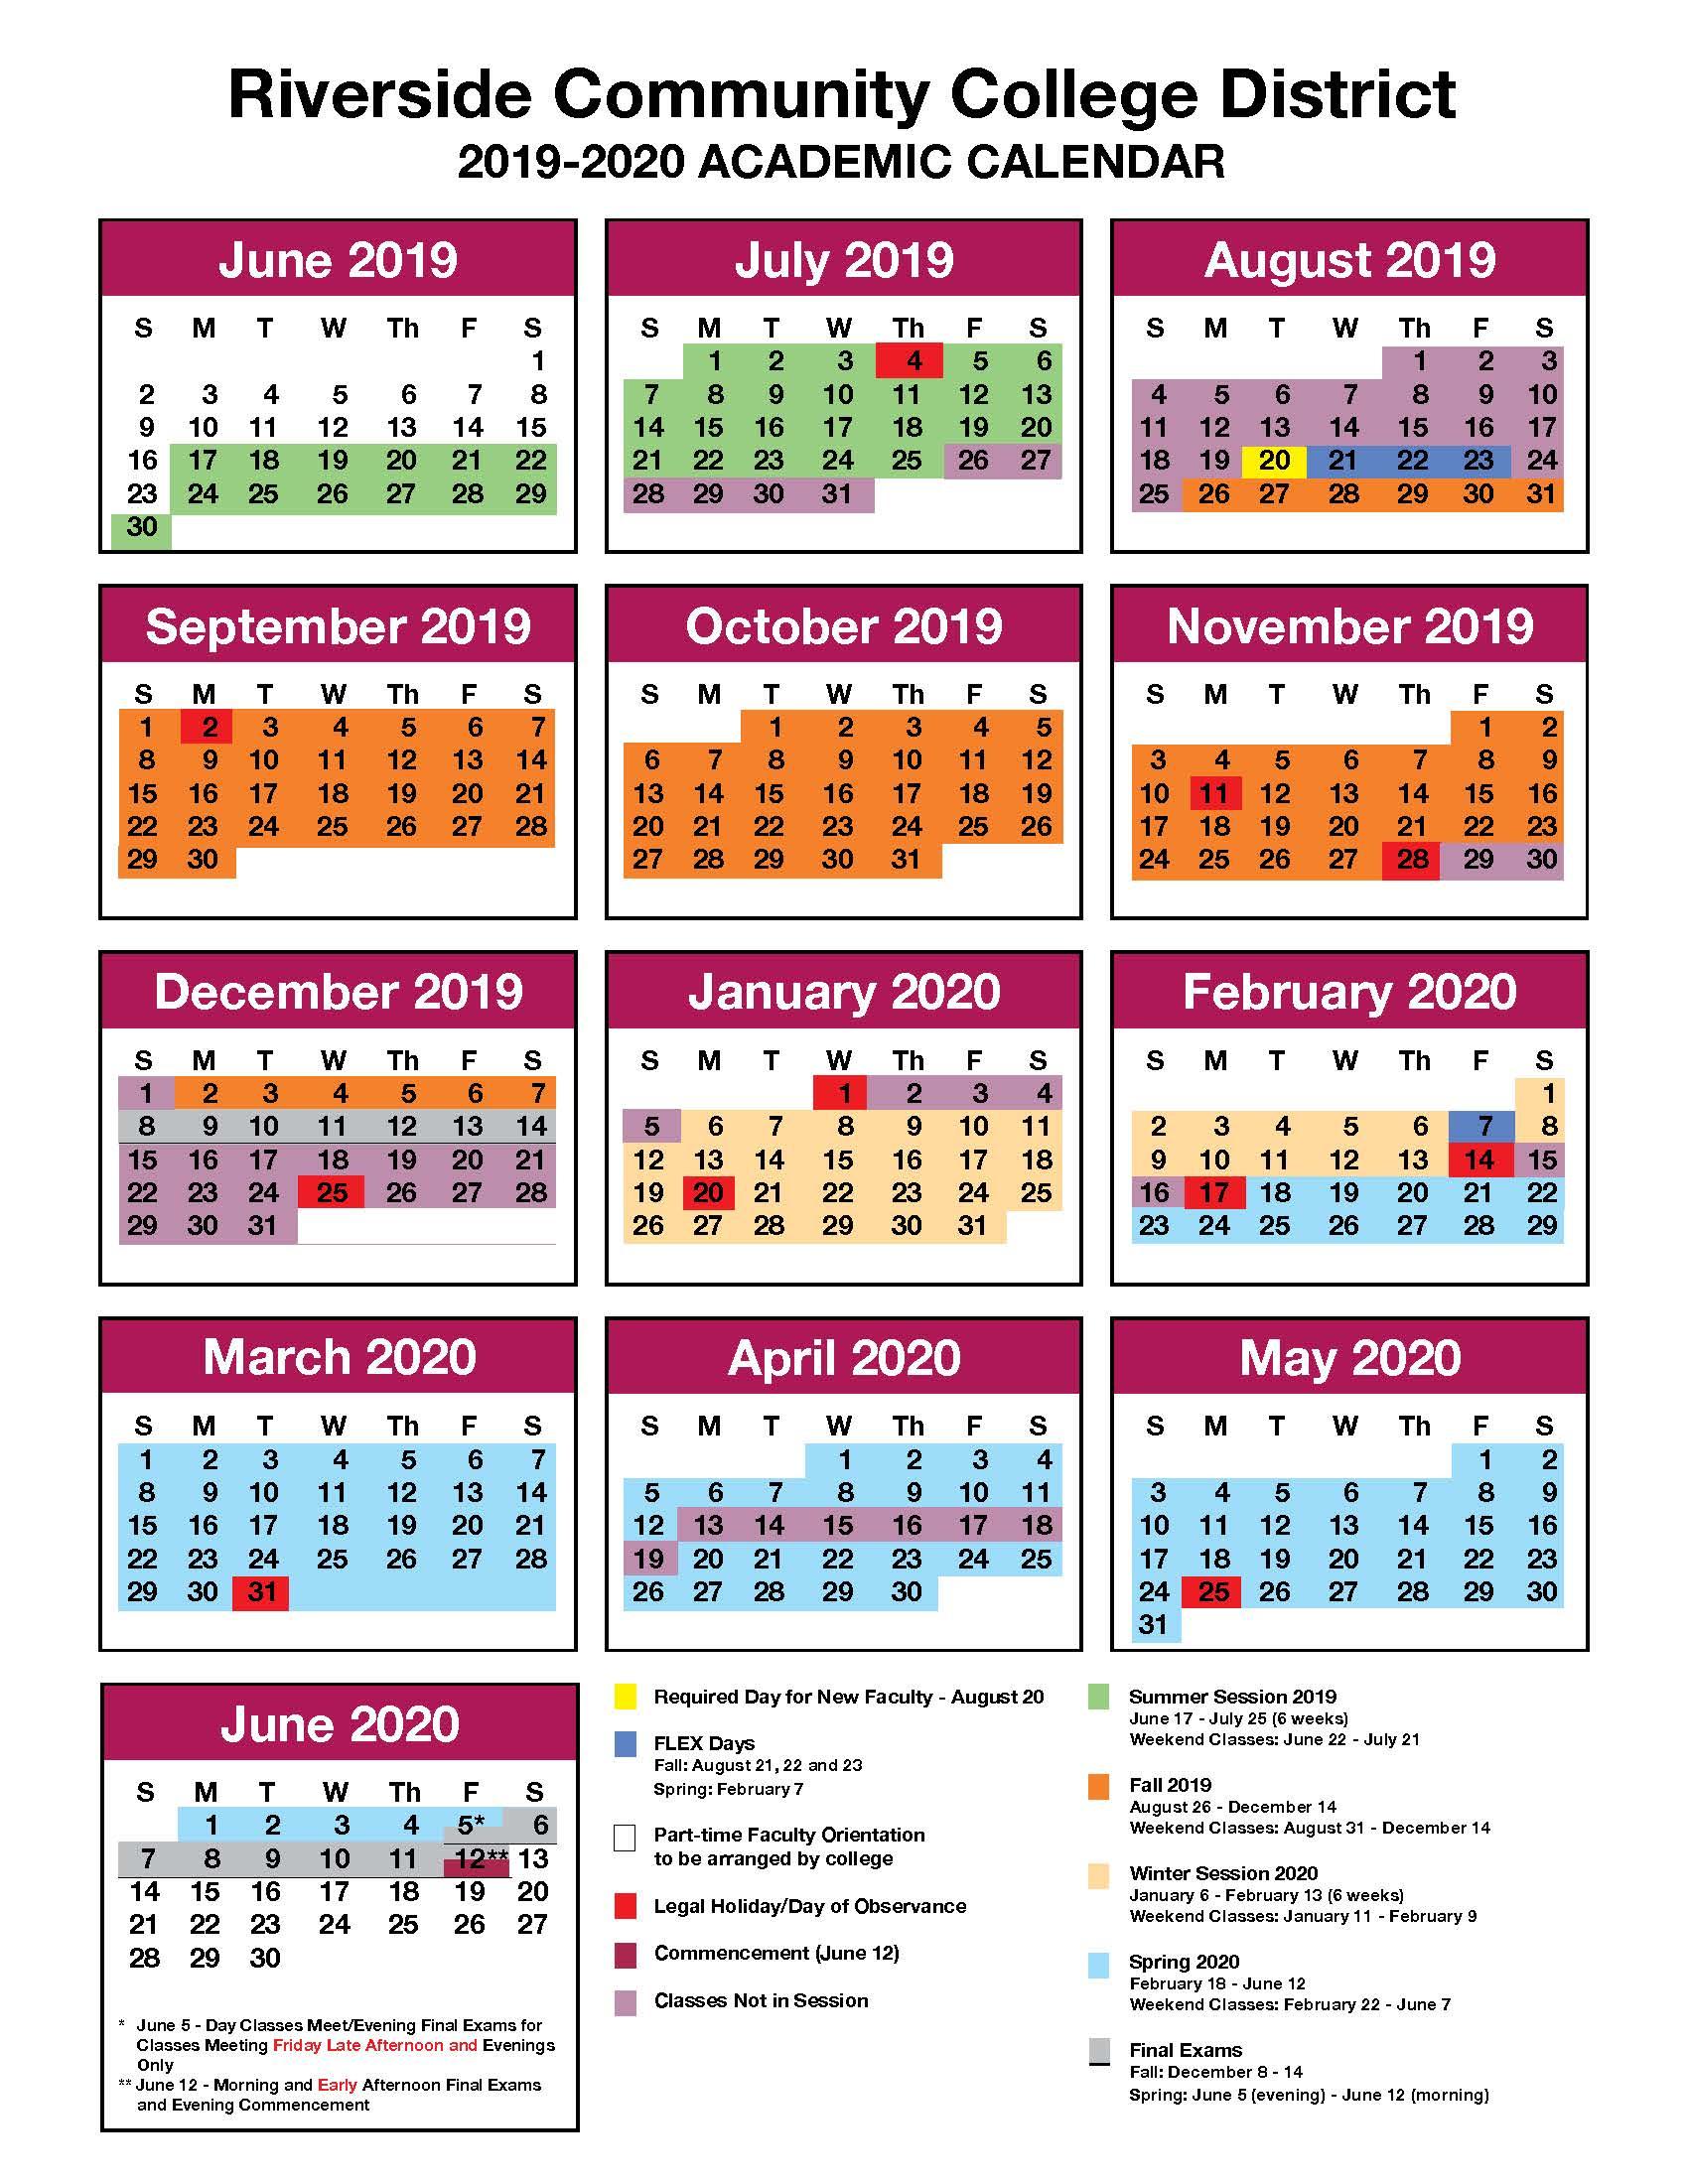 Jfk And Norco College Calendar 2019 2020 – John F. Kennedy For Wilson Nc Schoold Calendar